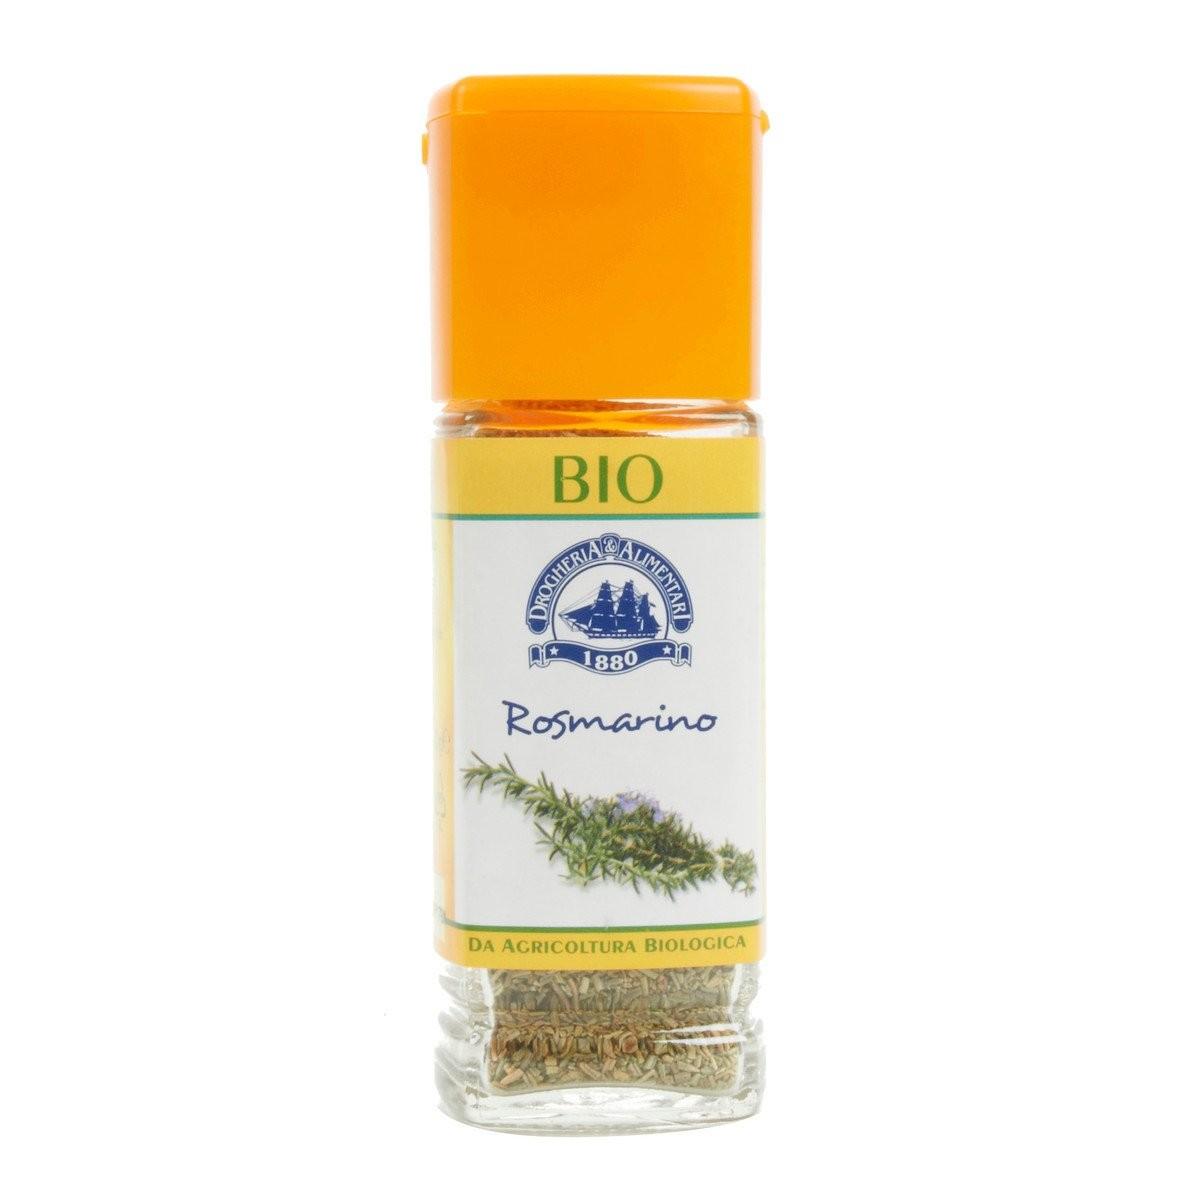 Drogheria&Alimentari Rosmarino bio